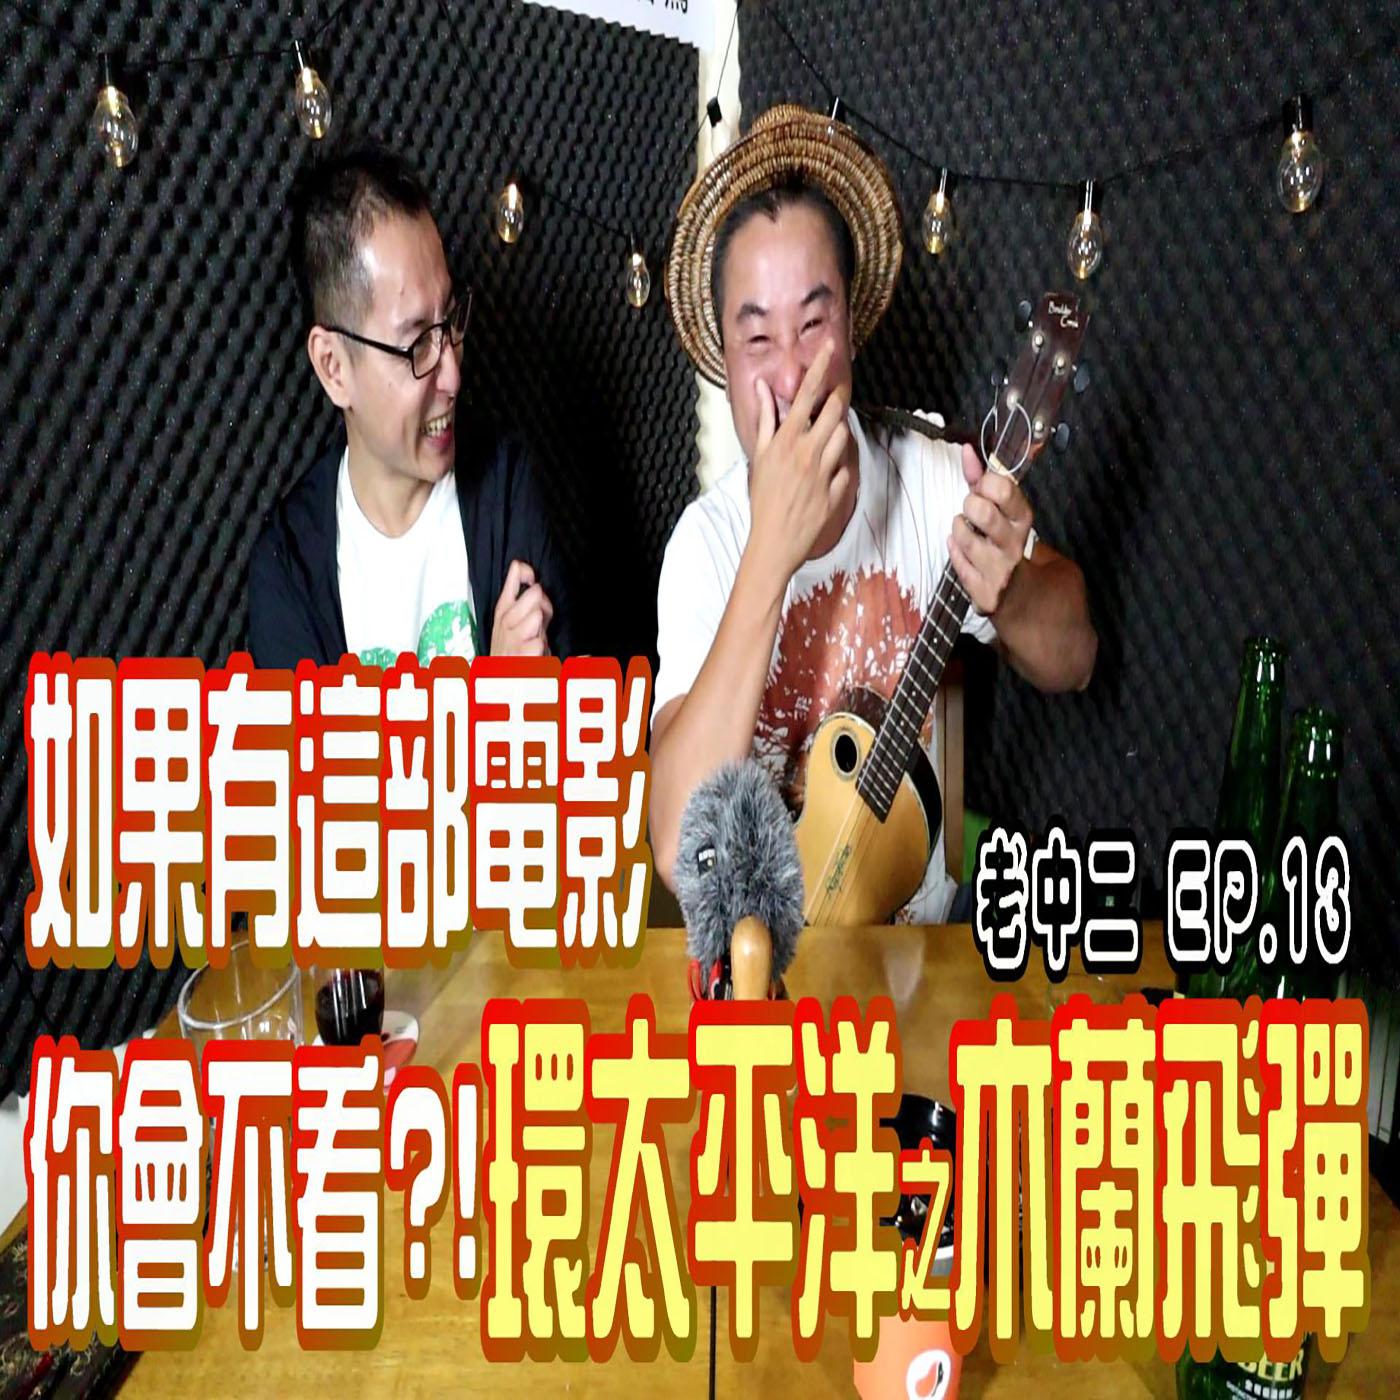 EP.13【老中二】環太平洋之木蘭飛彈 你會不想看?!